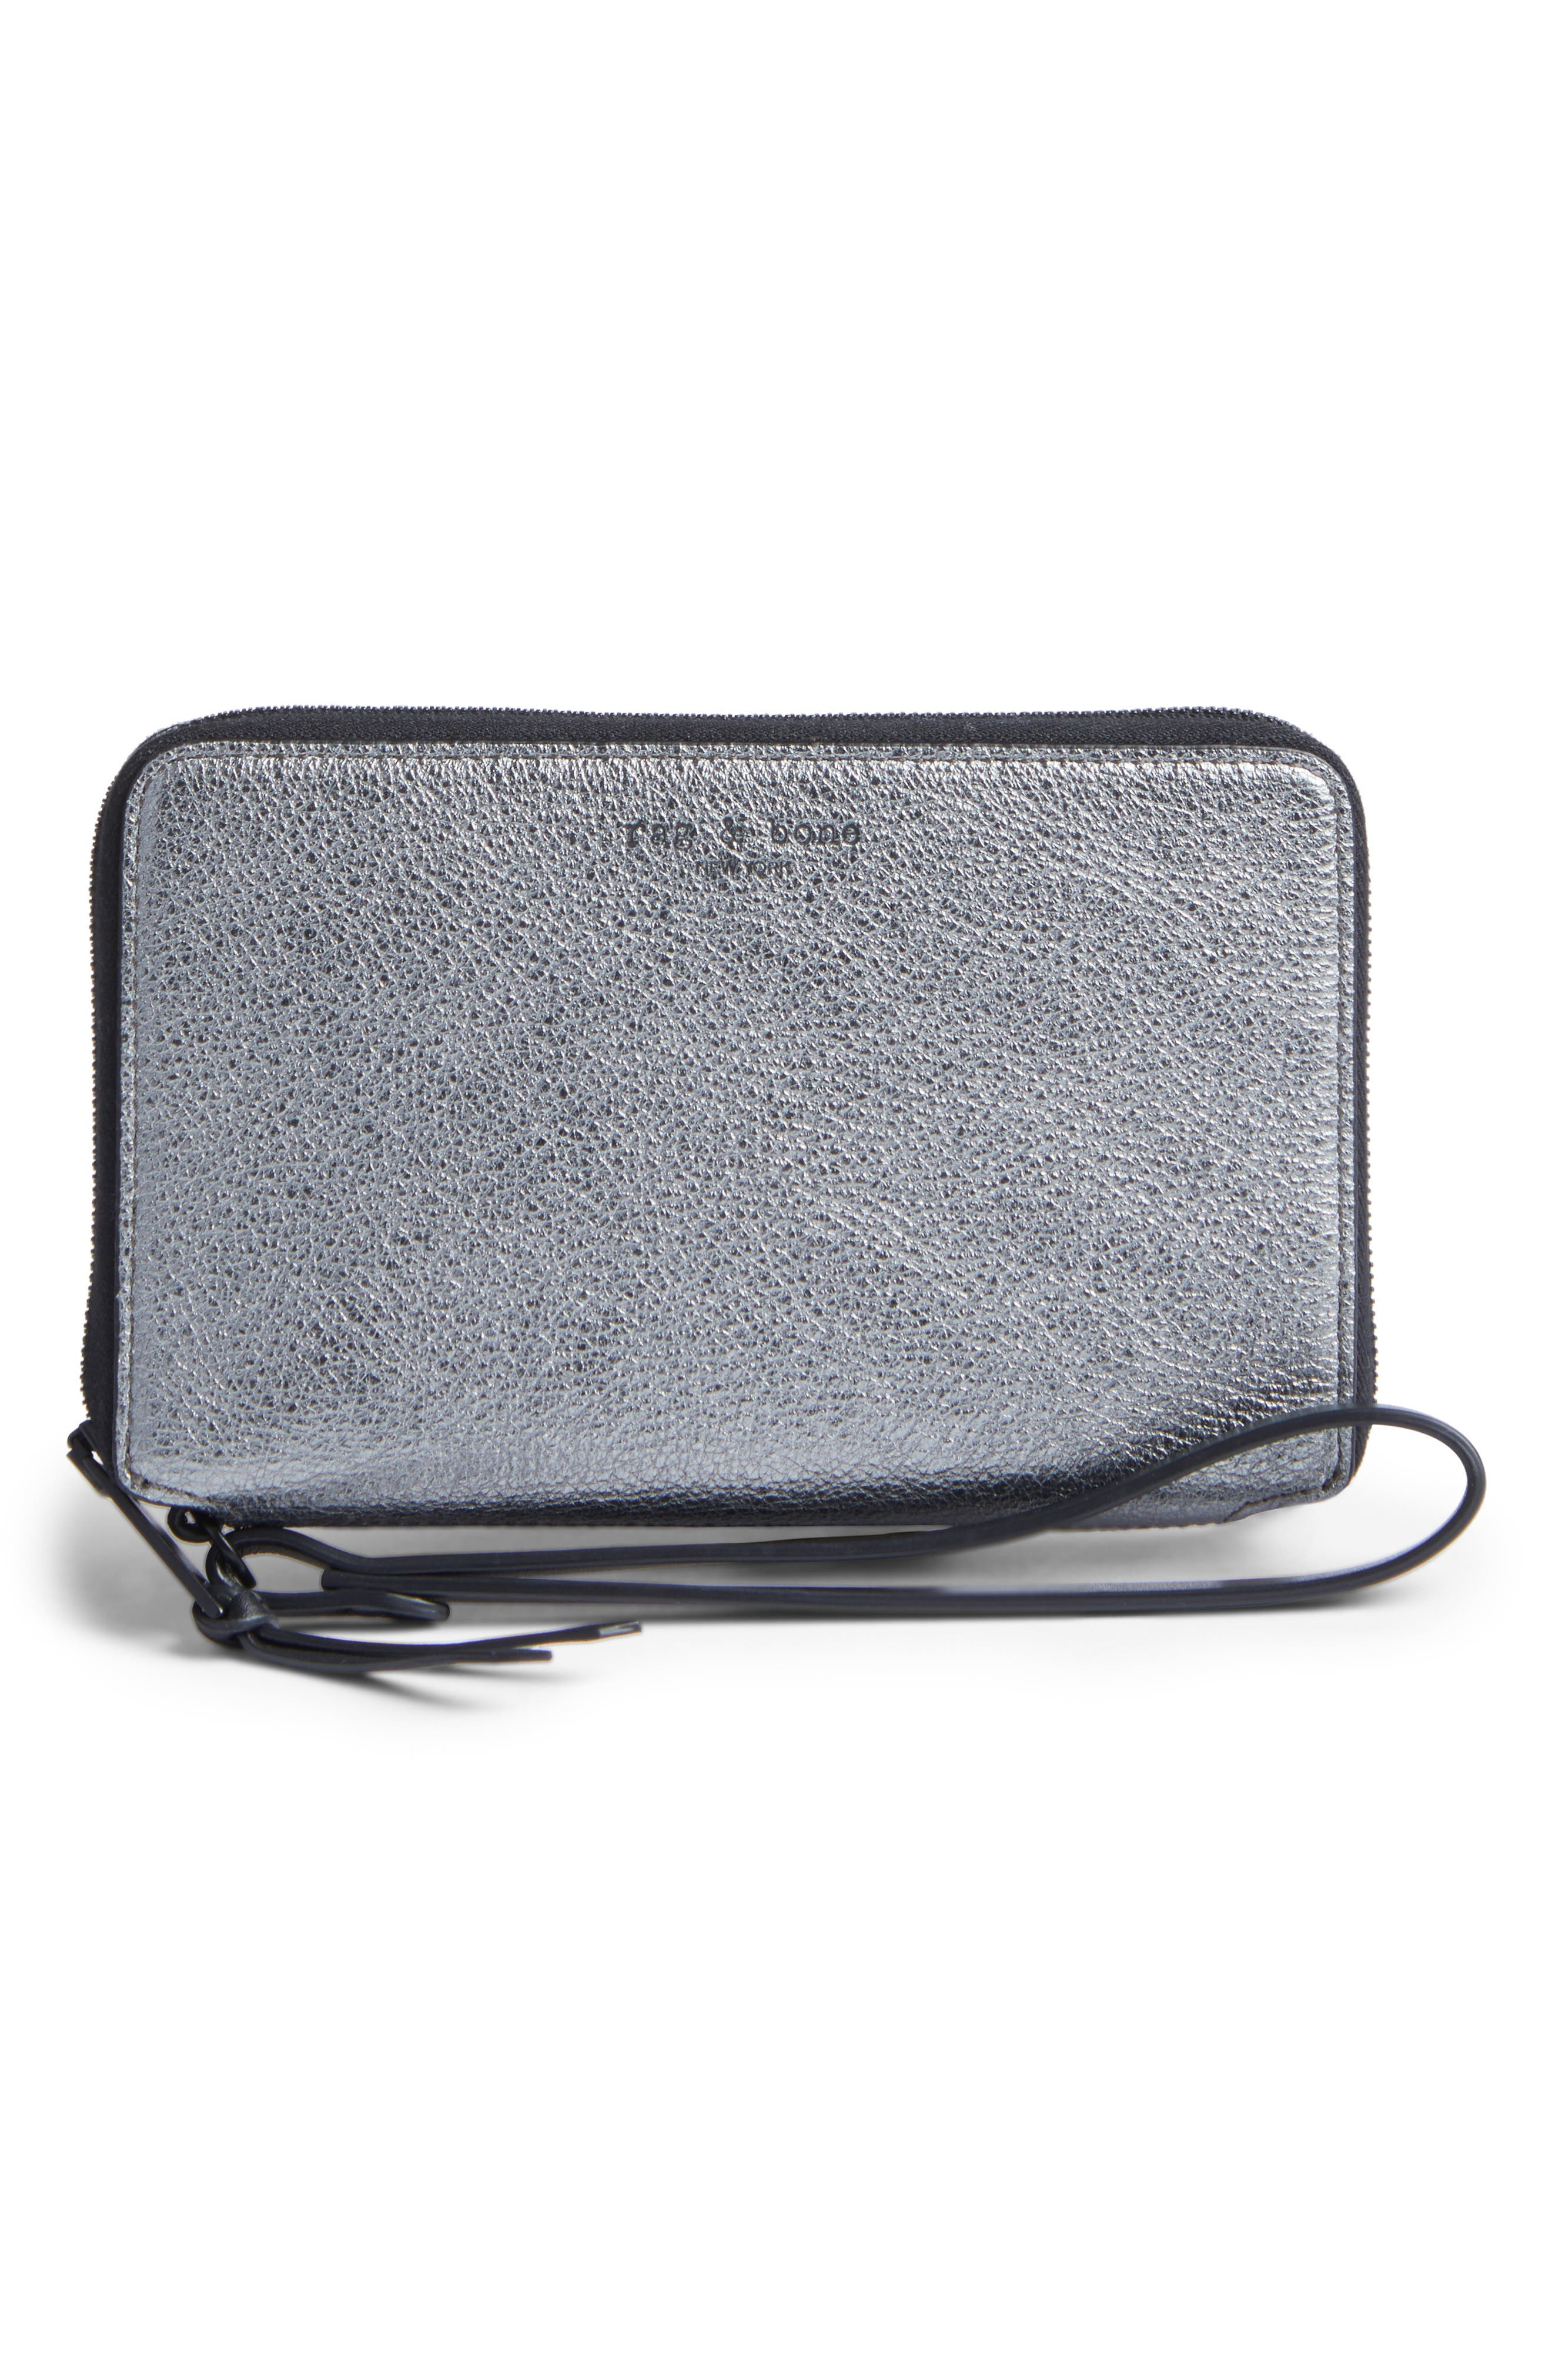 Devon Metallic Buffalo Leather Phone Wallet,                             Main thumbnail 1, color,                             Gunmetal